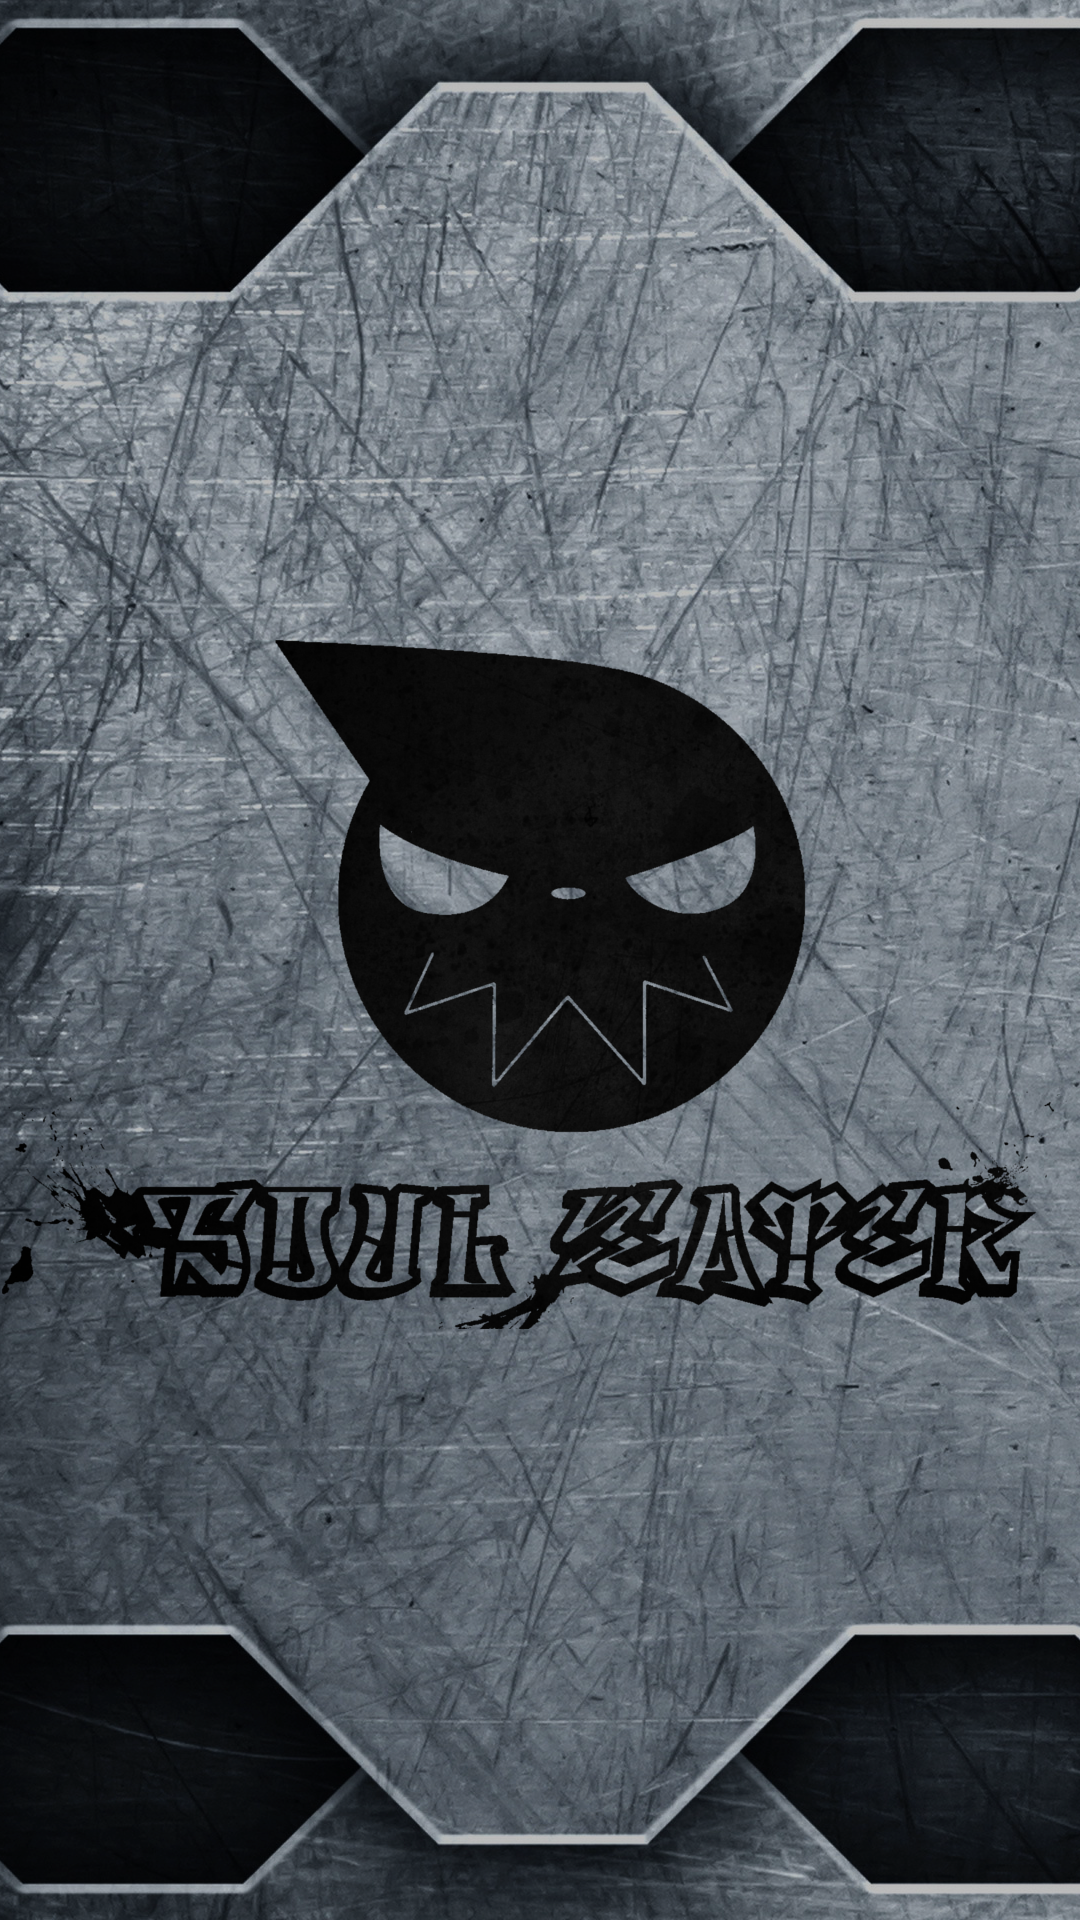 Hd wallpaper for smartphone - Soul Eater Fullhd Wallpaper Smartphonesoul Eaterwallpapers